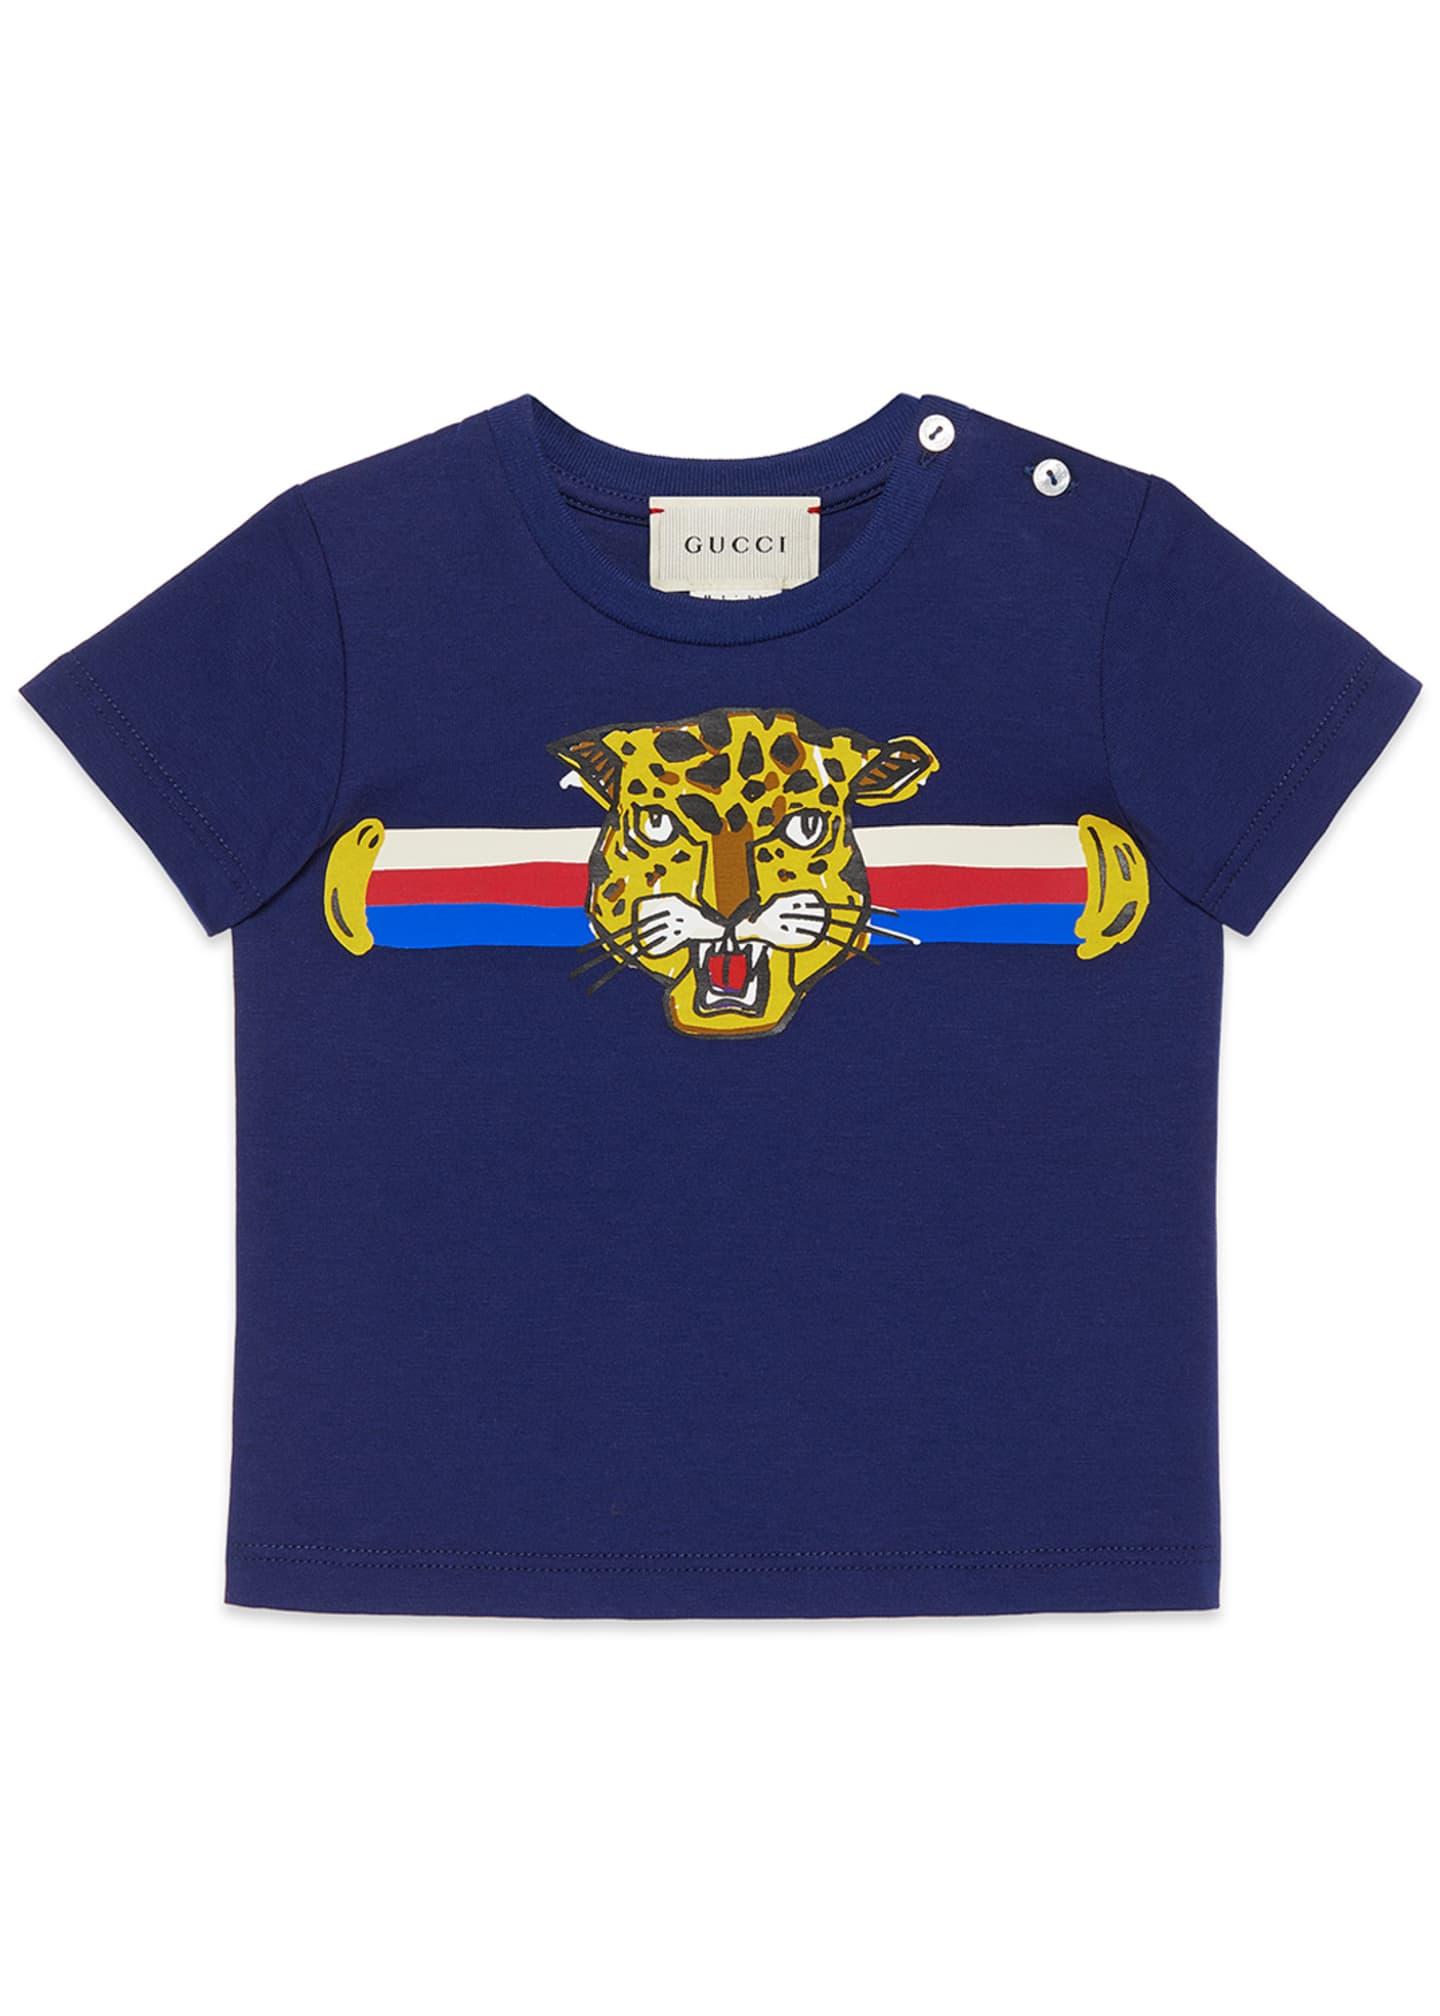 Gucci Boys' Cat Graphic Crewneck T-Shirt, Size 12-36